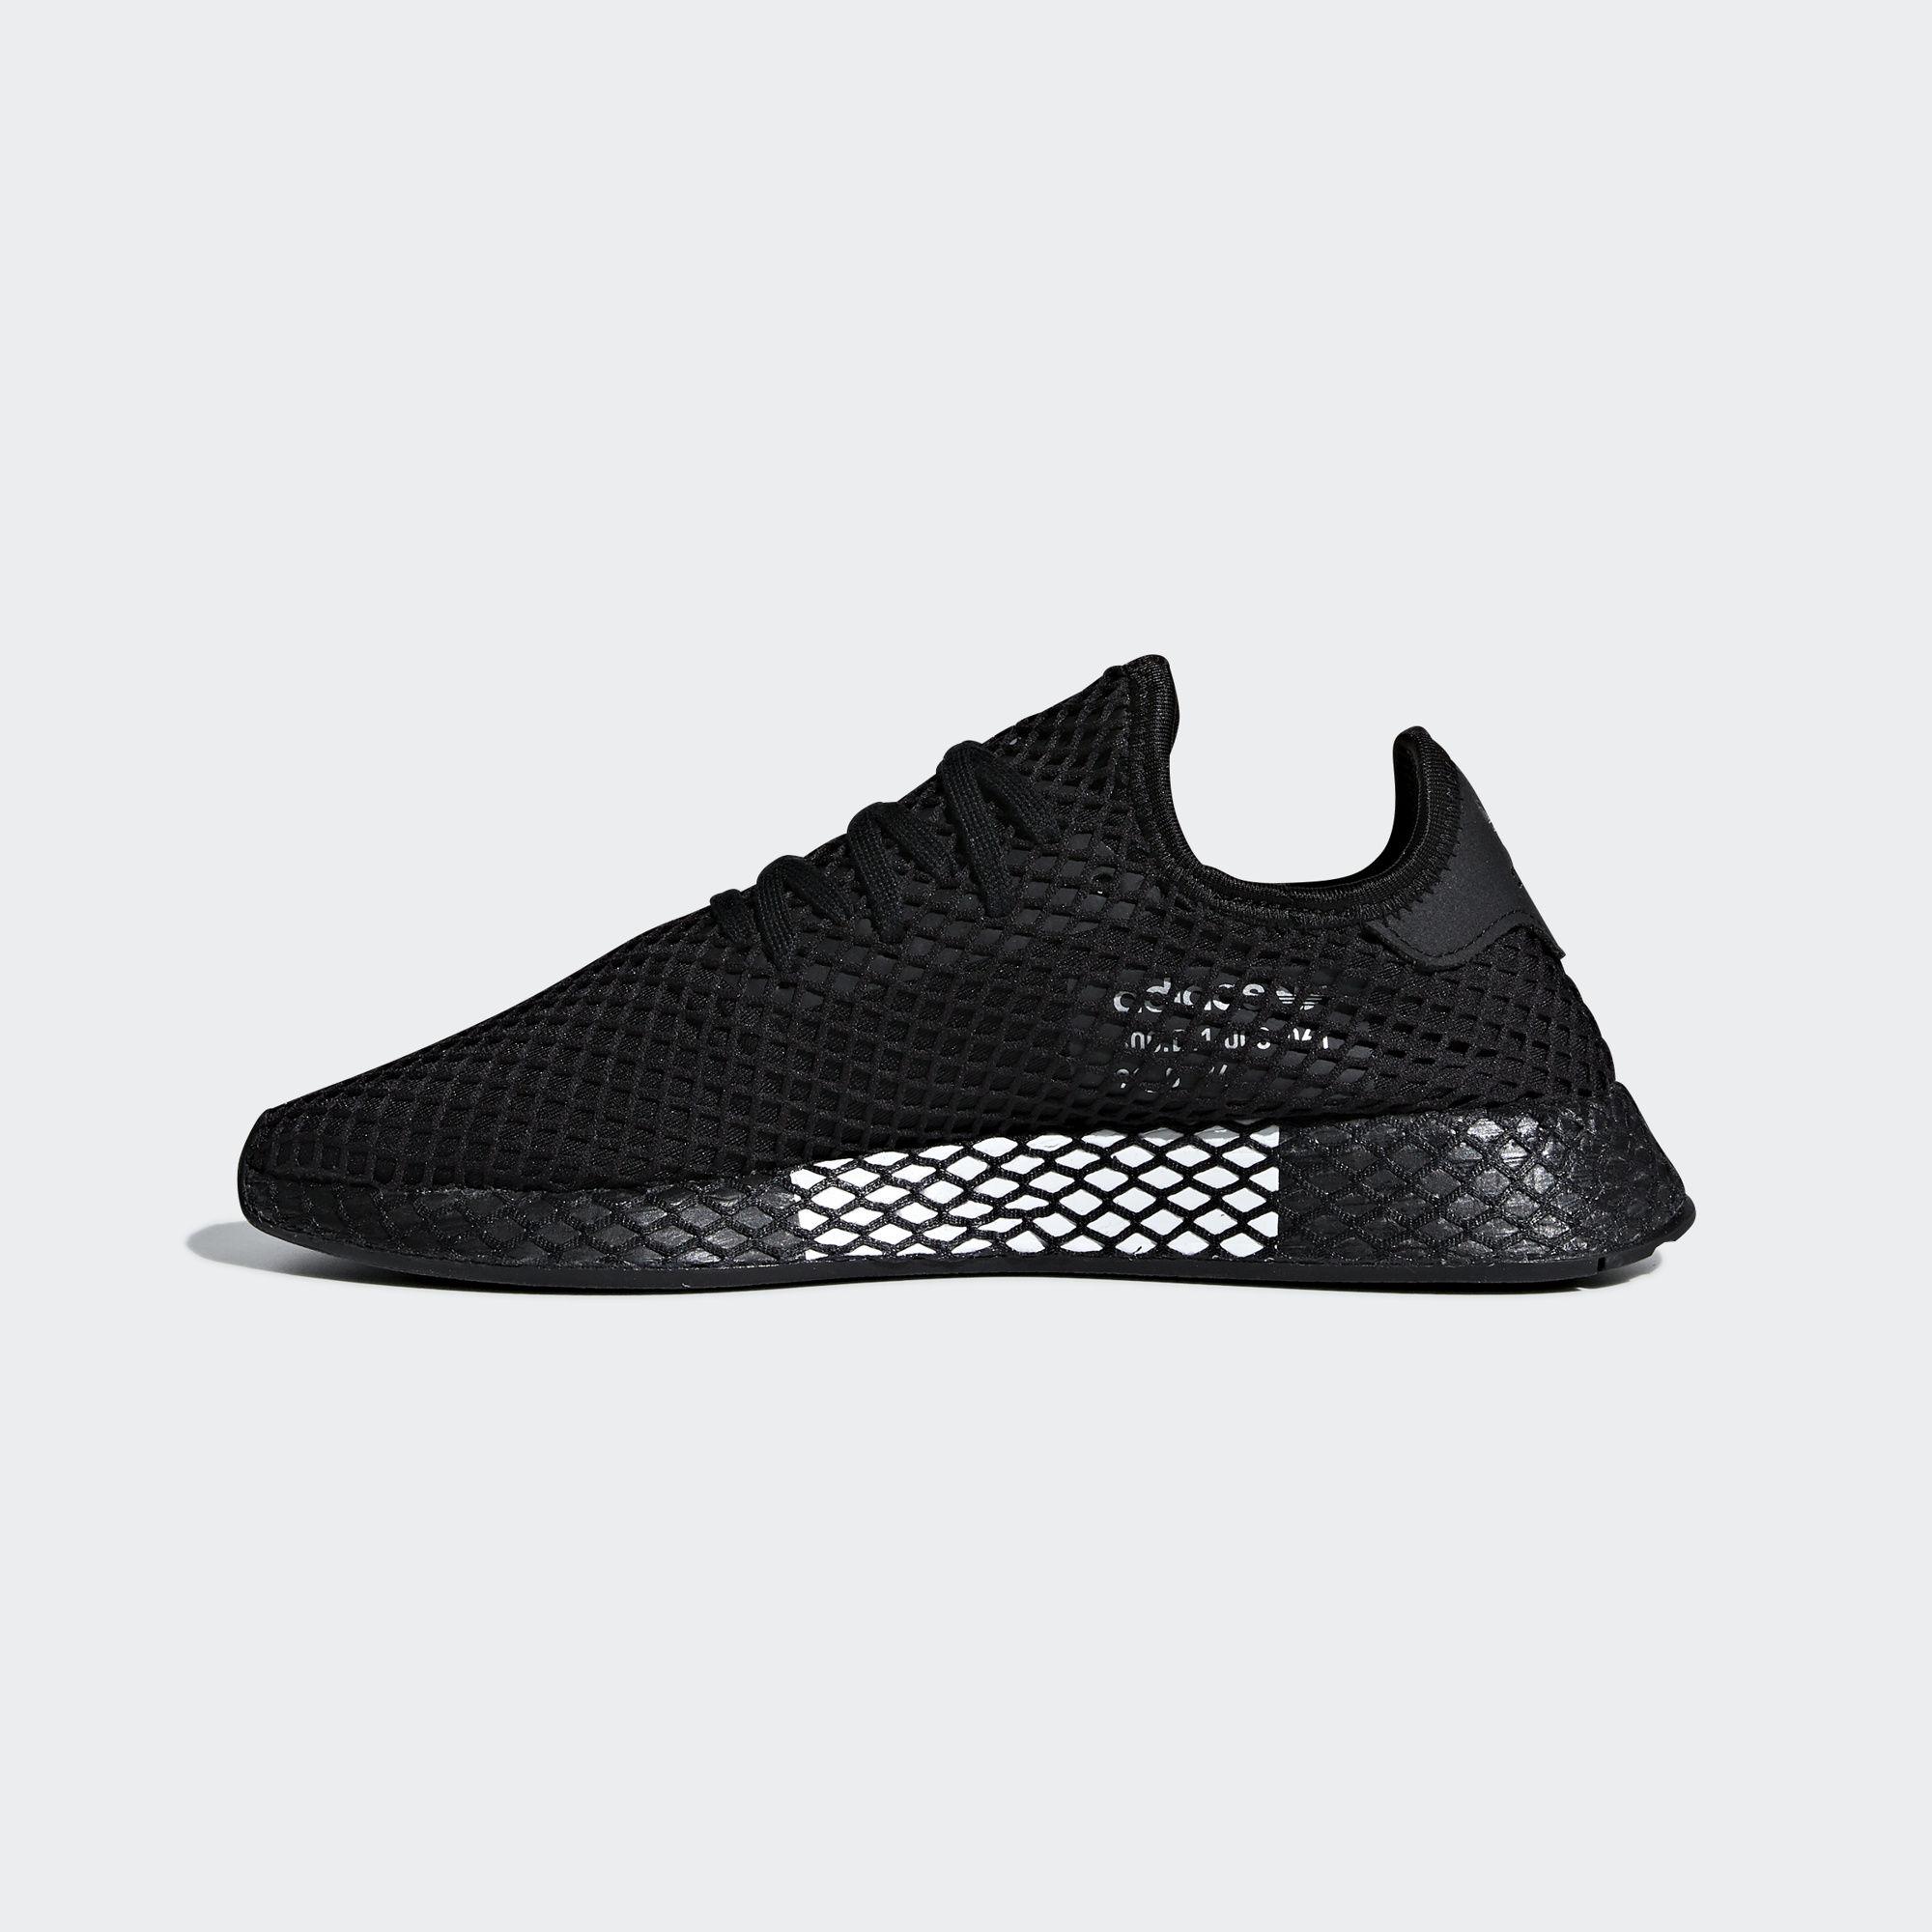 Adidas Deerupt Runner Core Black / Core Black / Ftwr White (B41768)